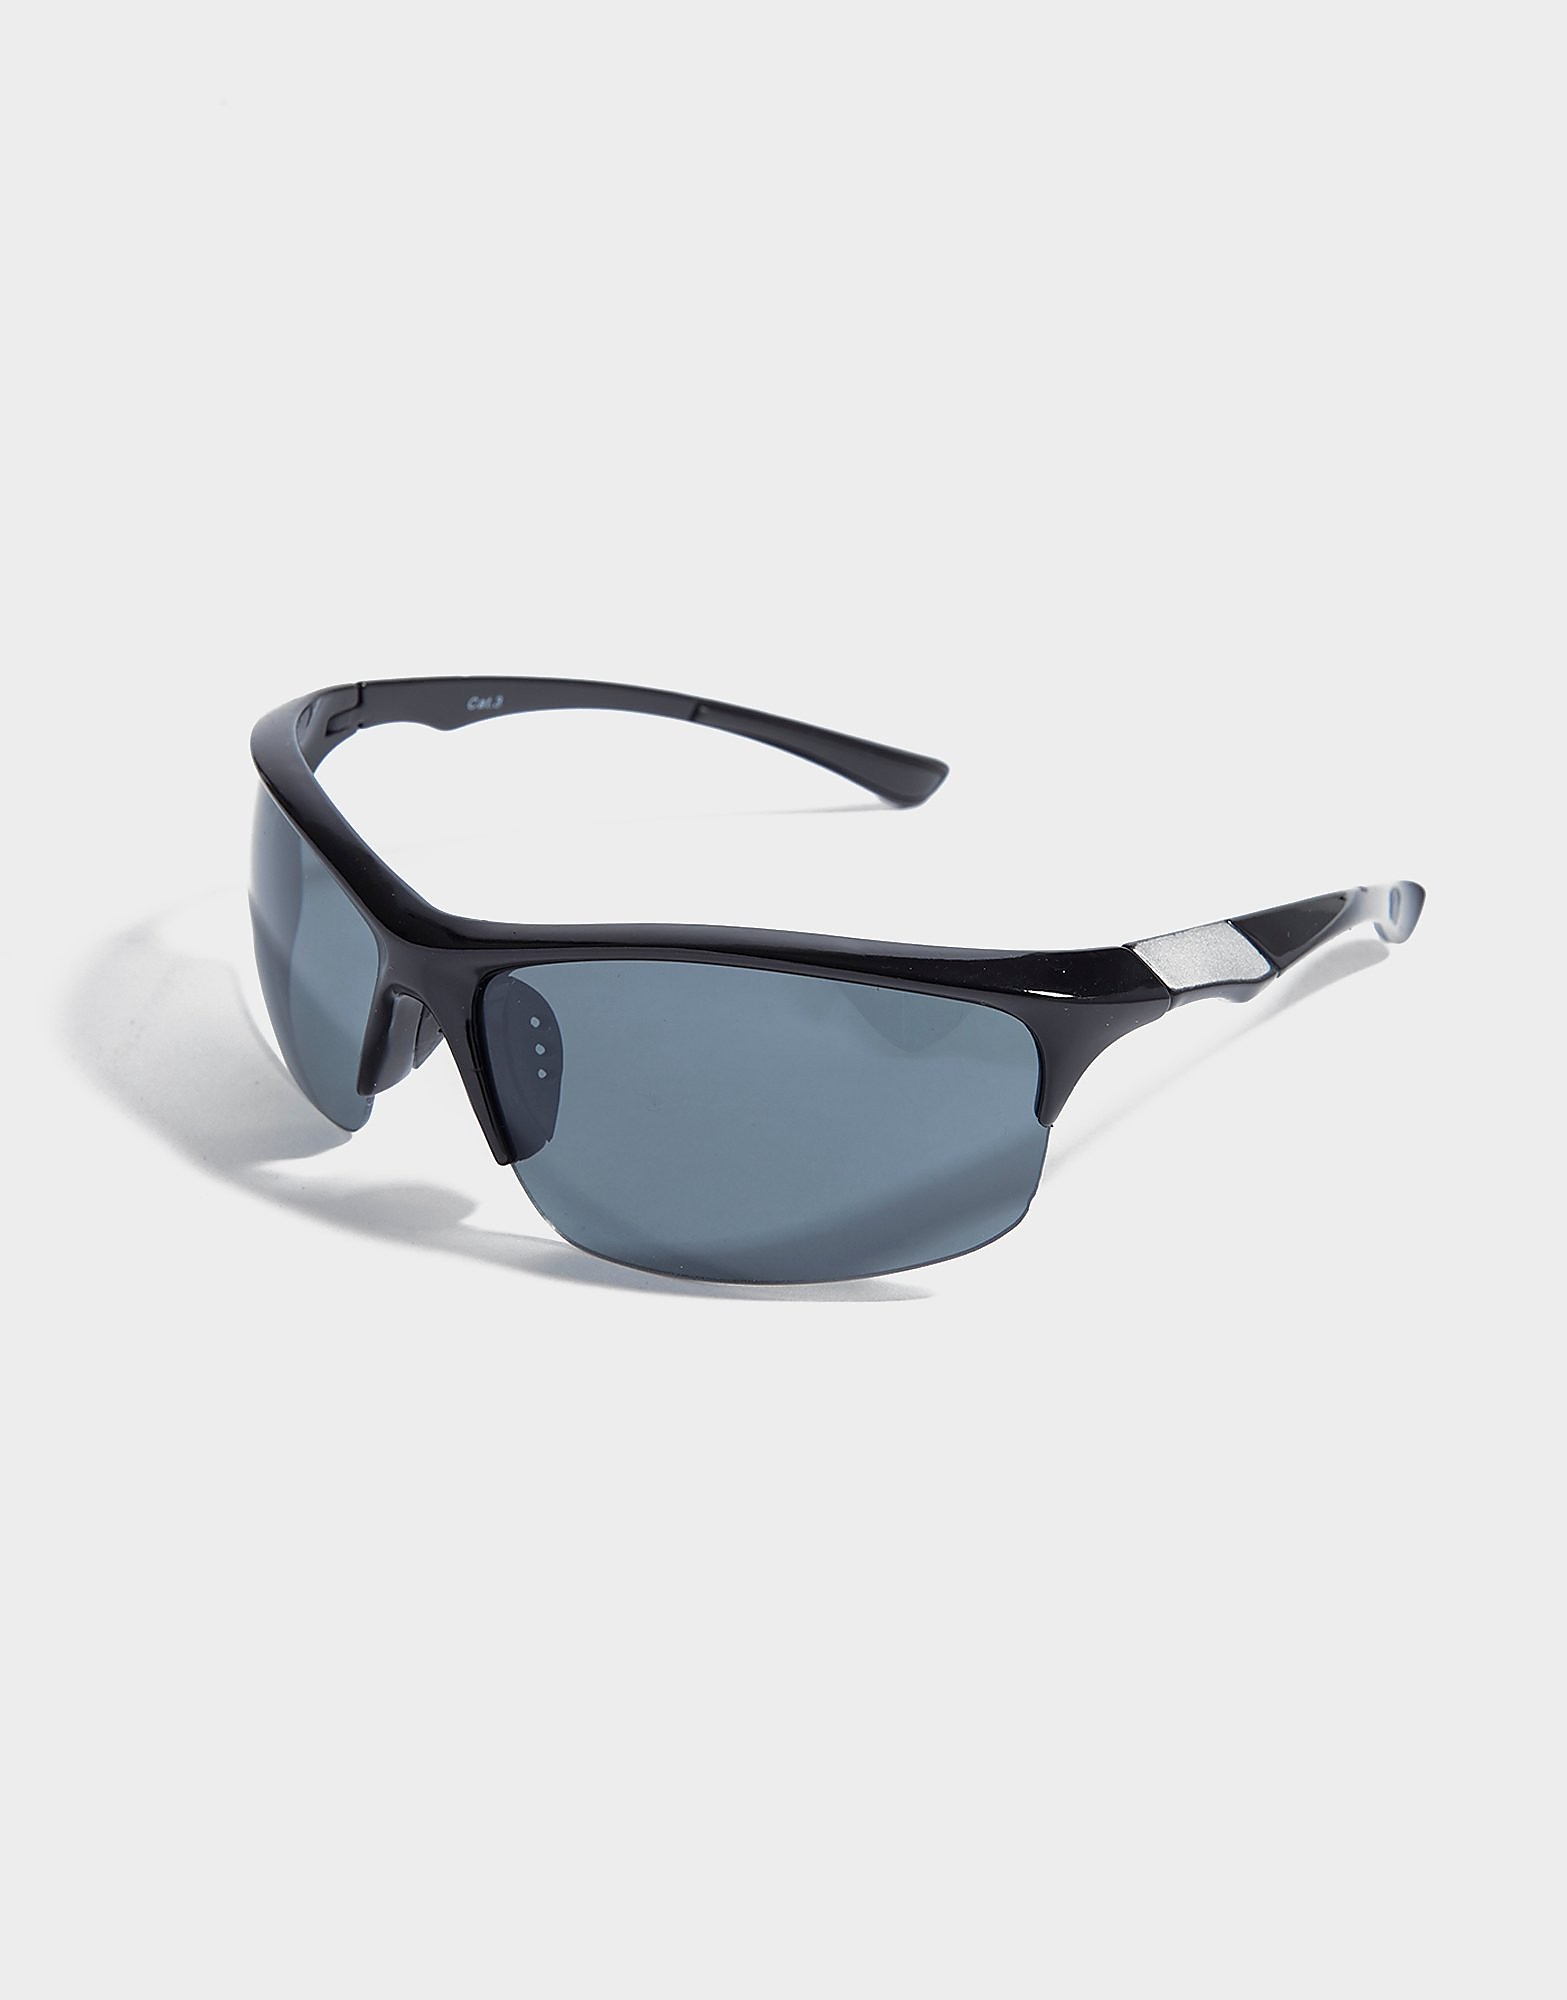 Brookhaven Richard solglasögon